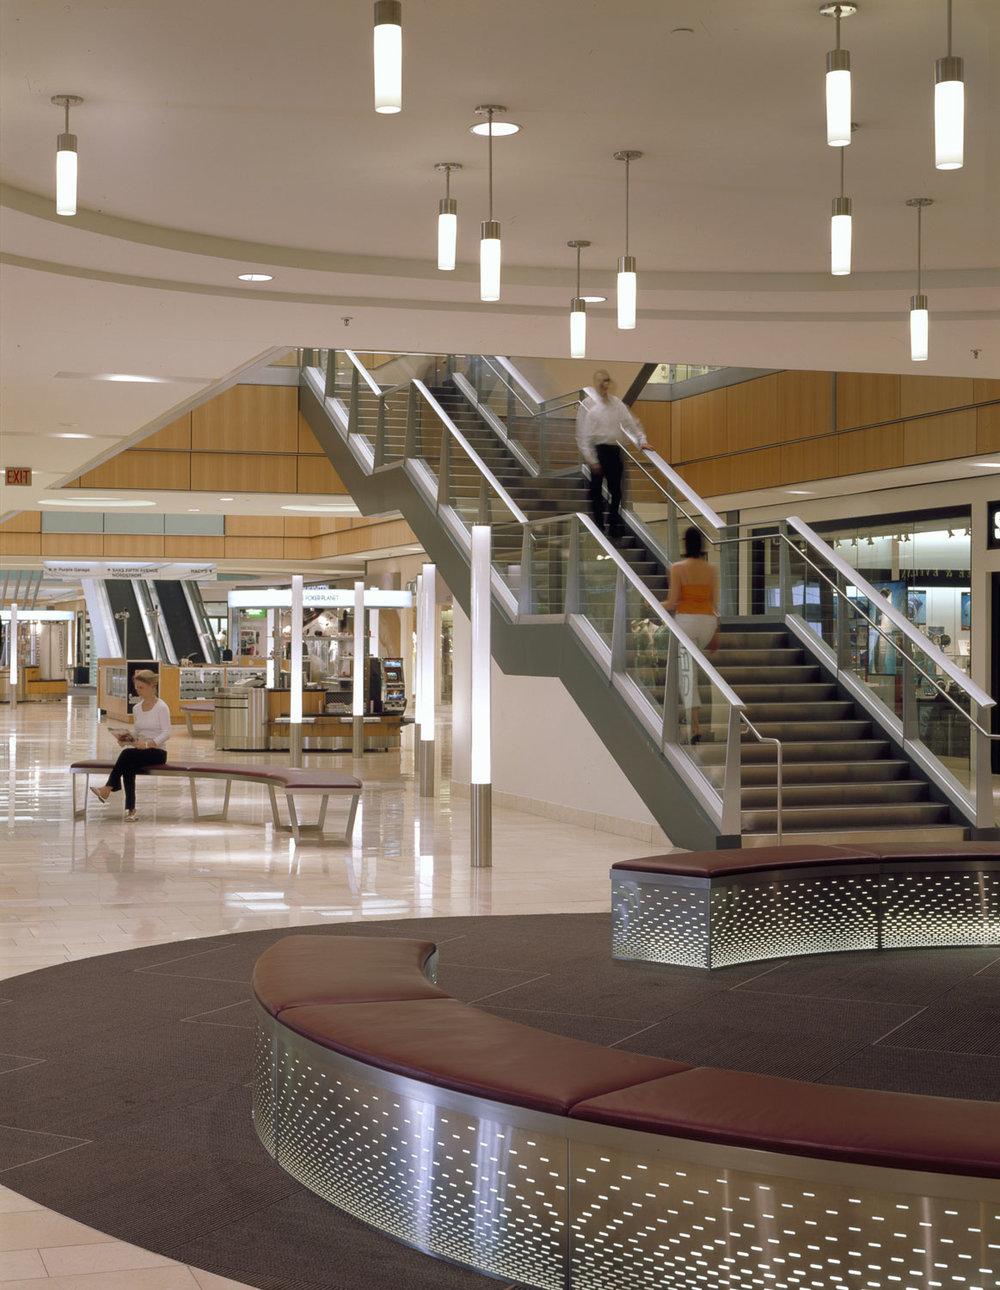 Galleria_web-23.jpg